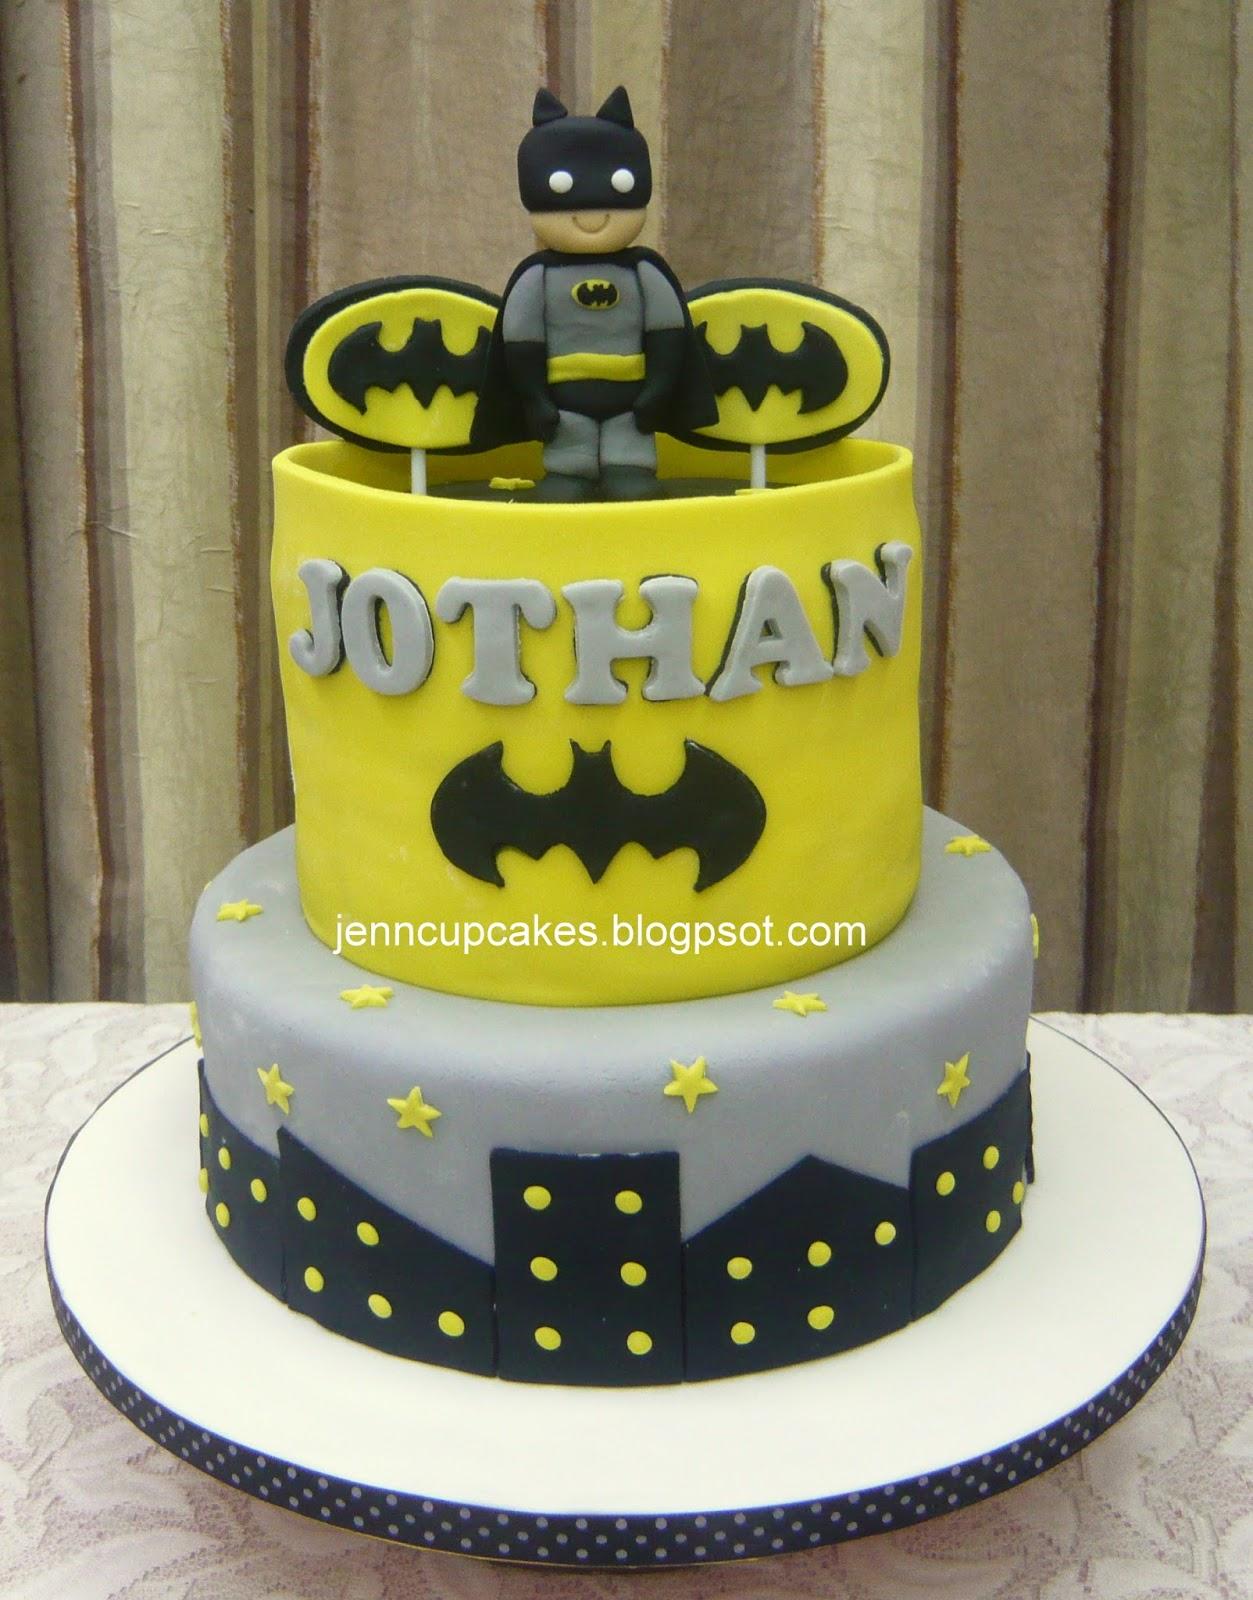 Jenn Cupcakes & Muffins: Batman Theme Cake